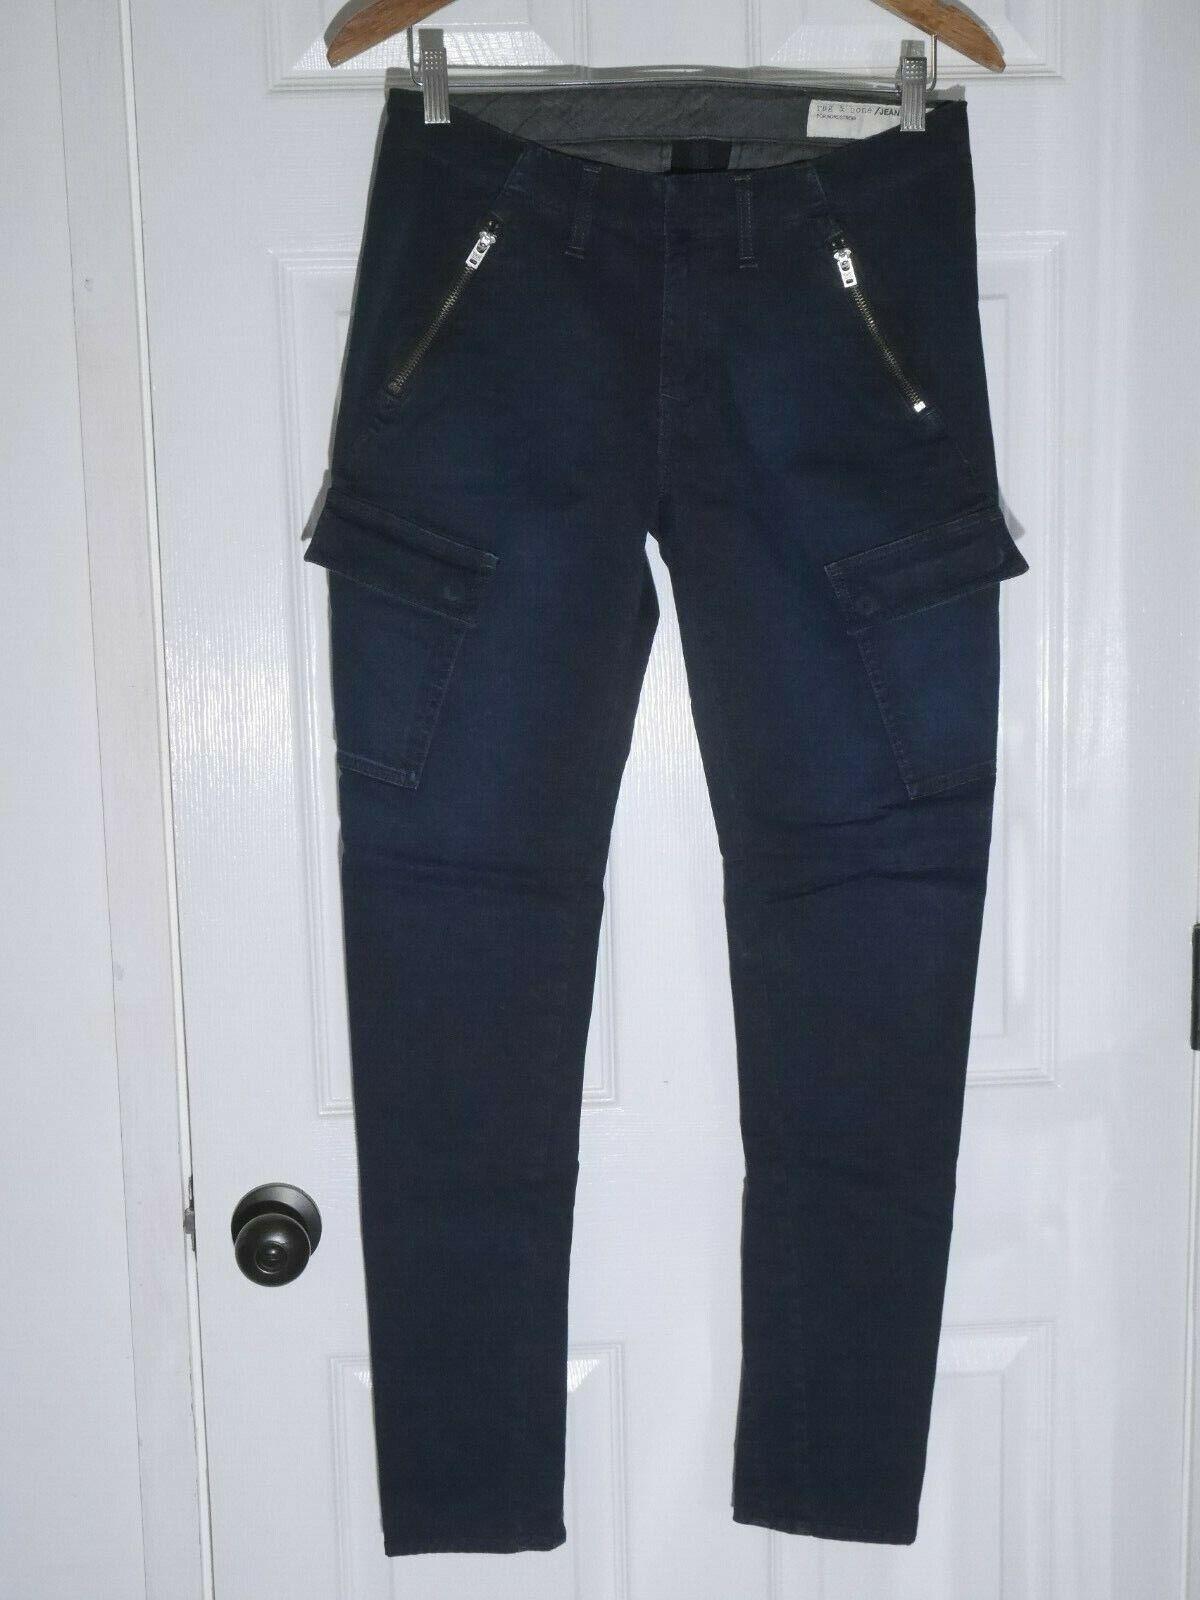 Rag & Bone Bowery Cargo Skinny Pants in Distressed Navy - Size 27